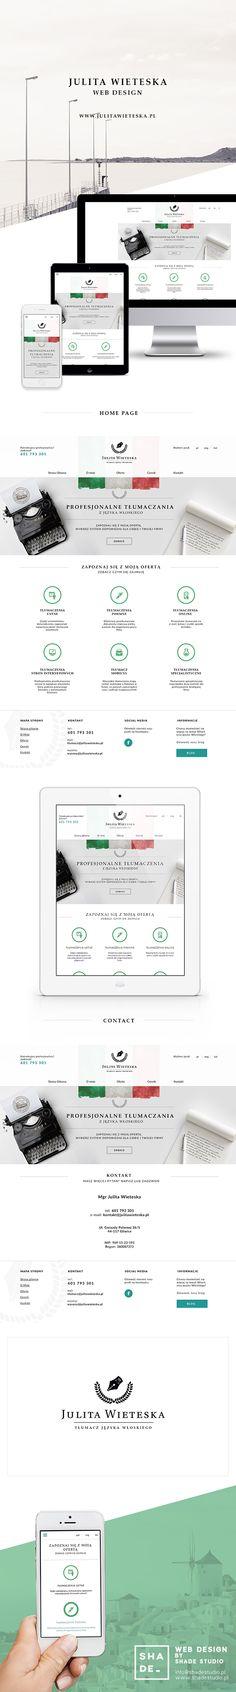 Julita Wieteska Web Design